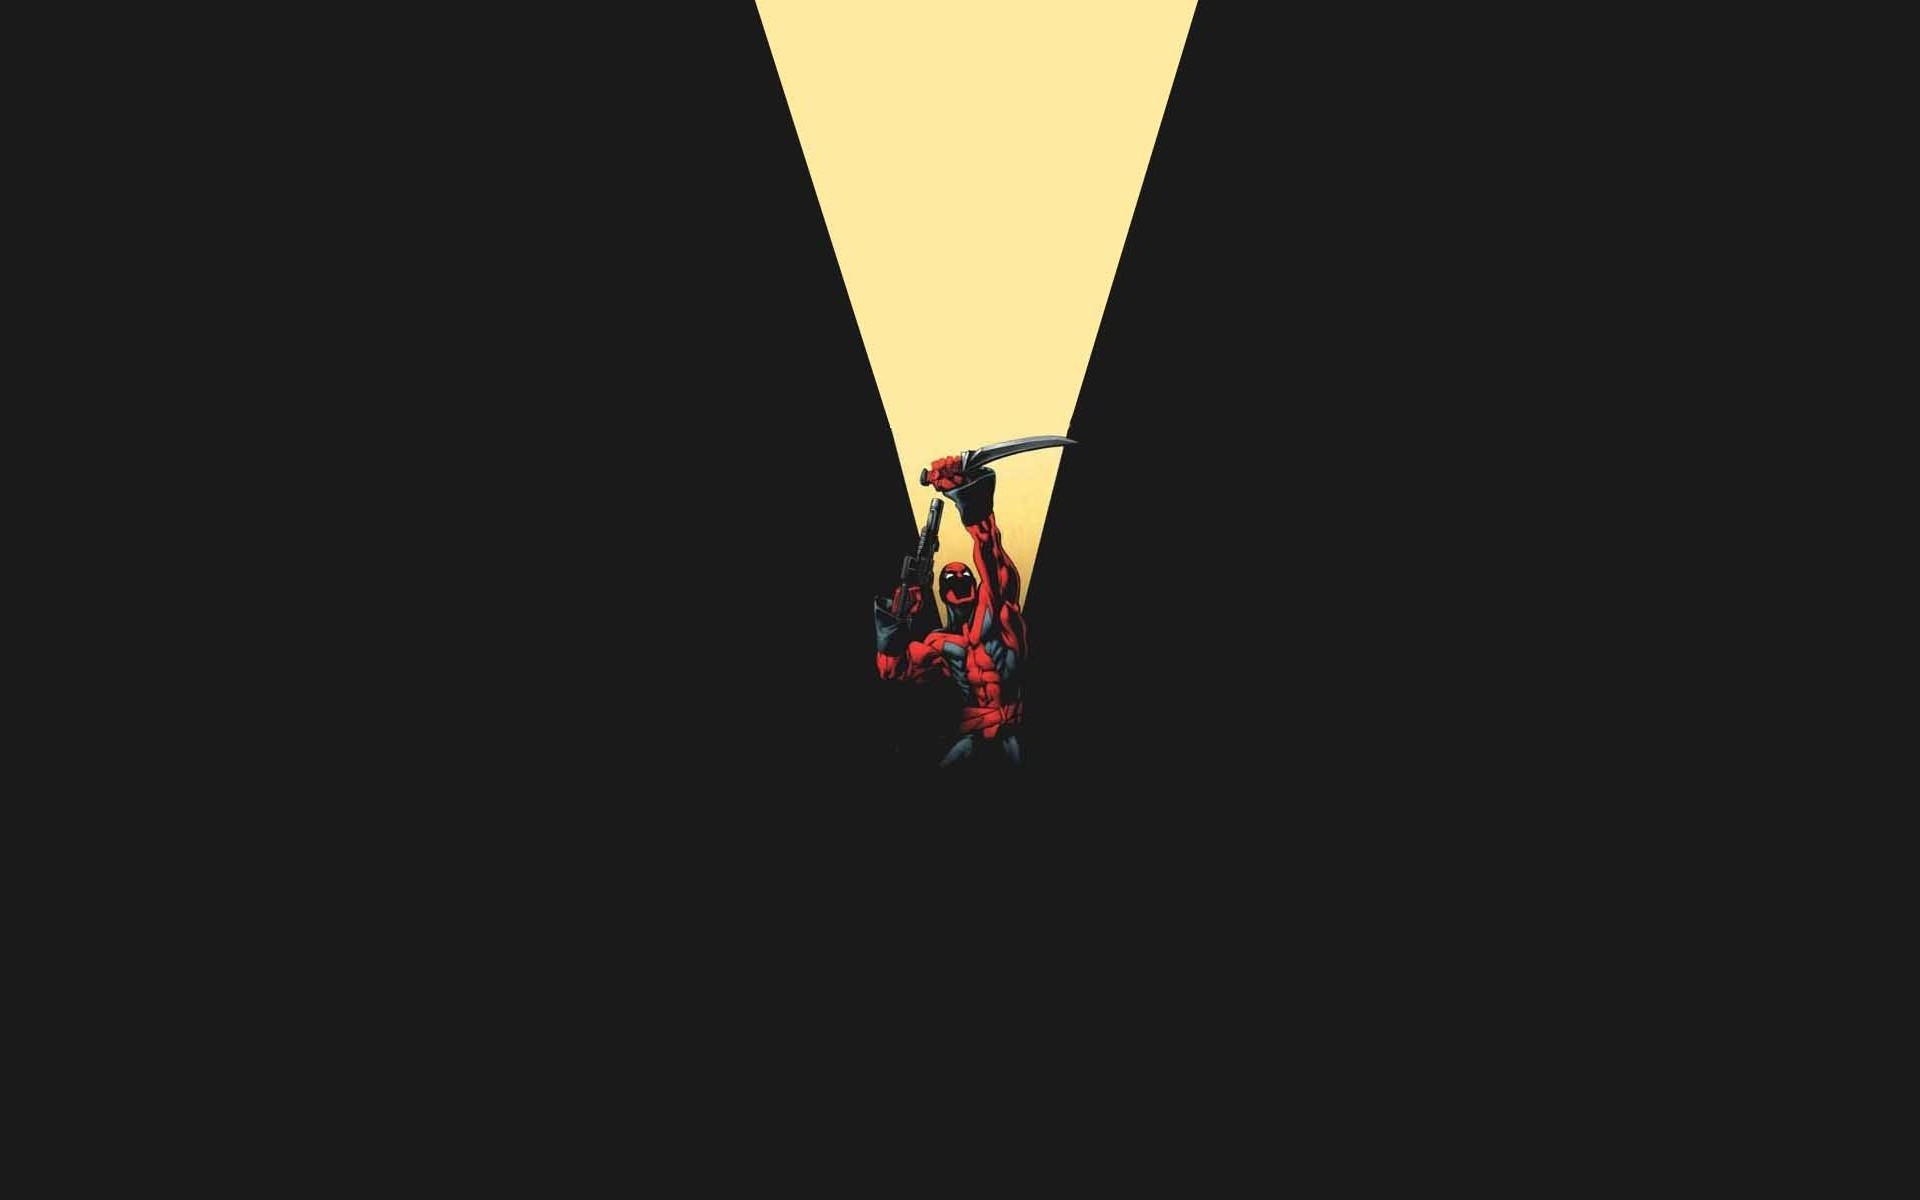 Deadpool Wallpaper Android Hd: Deadpool HD Wallpaper ·① Download Free Cool Backgrounds